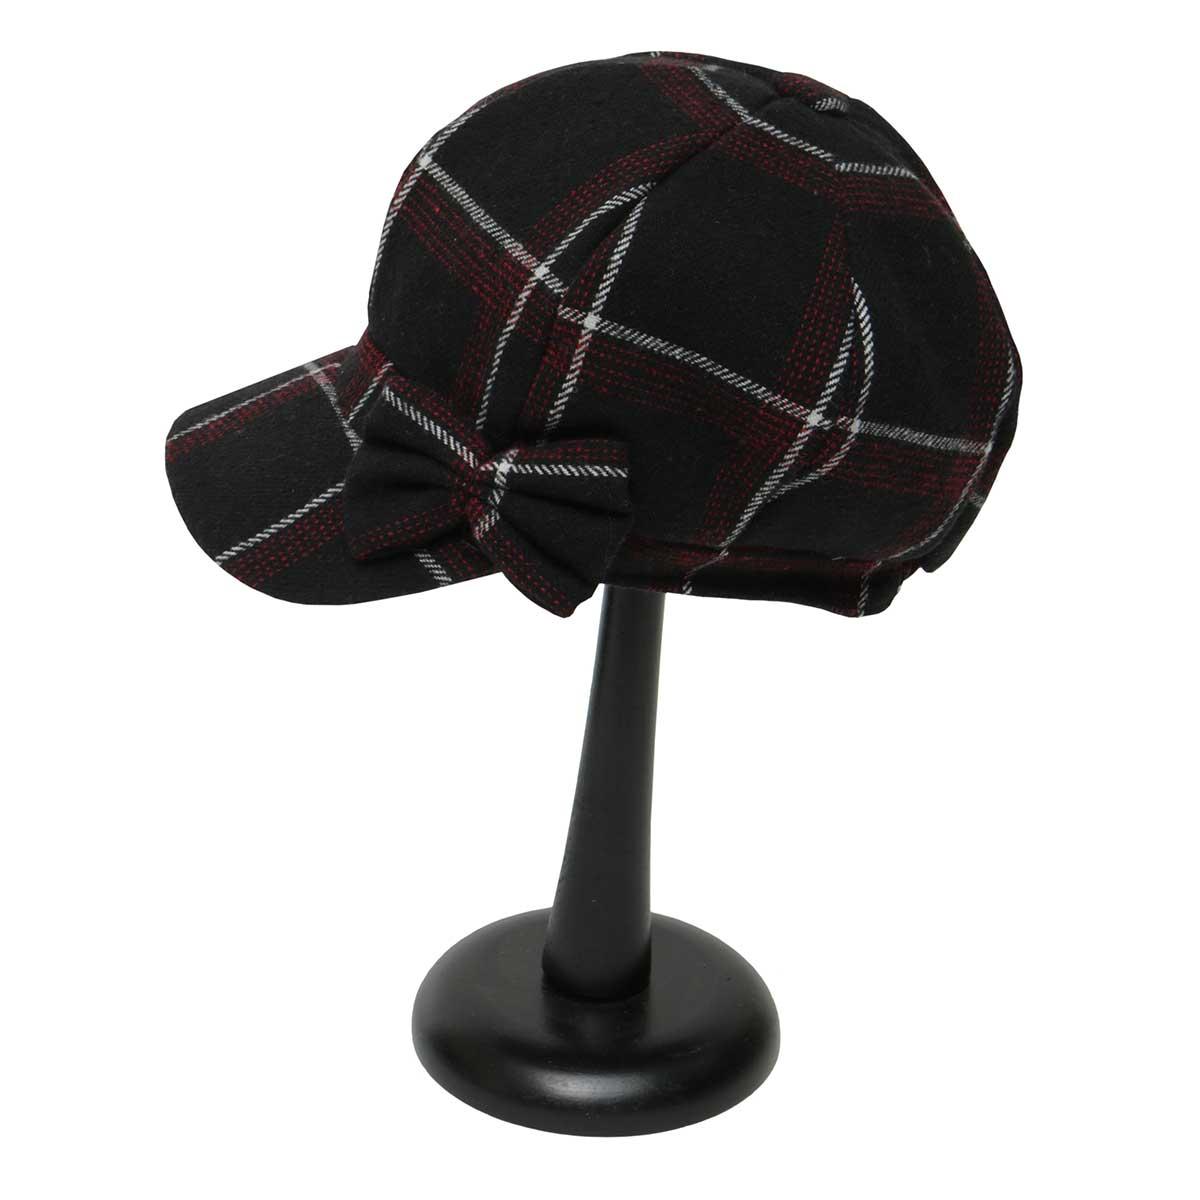 BK/BU PLAID SLOUCH HAT